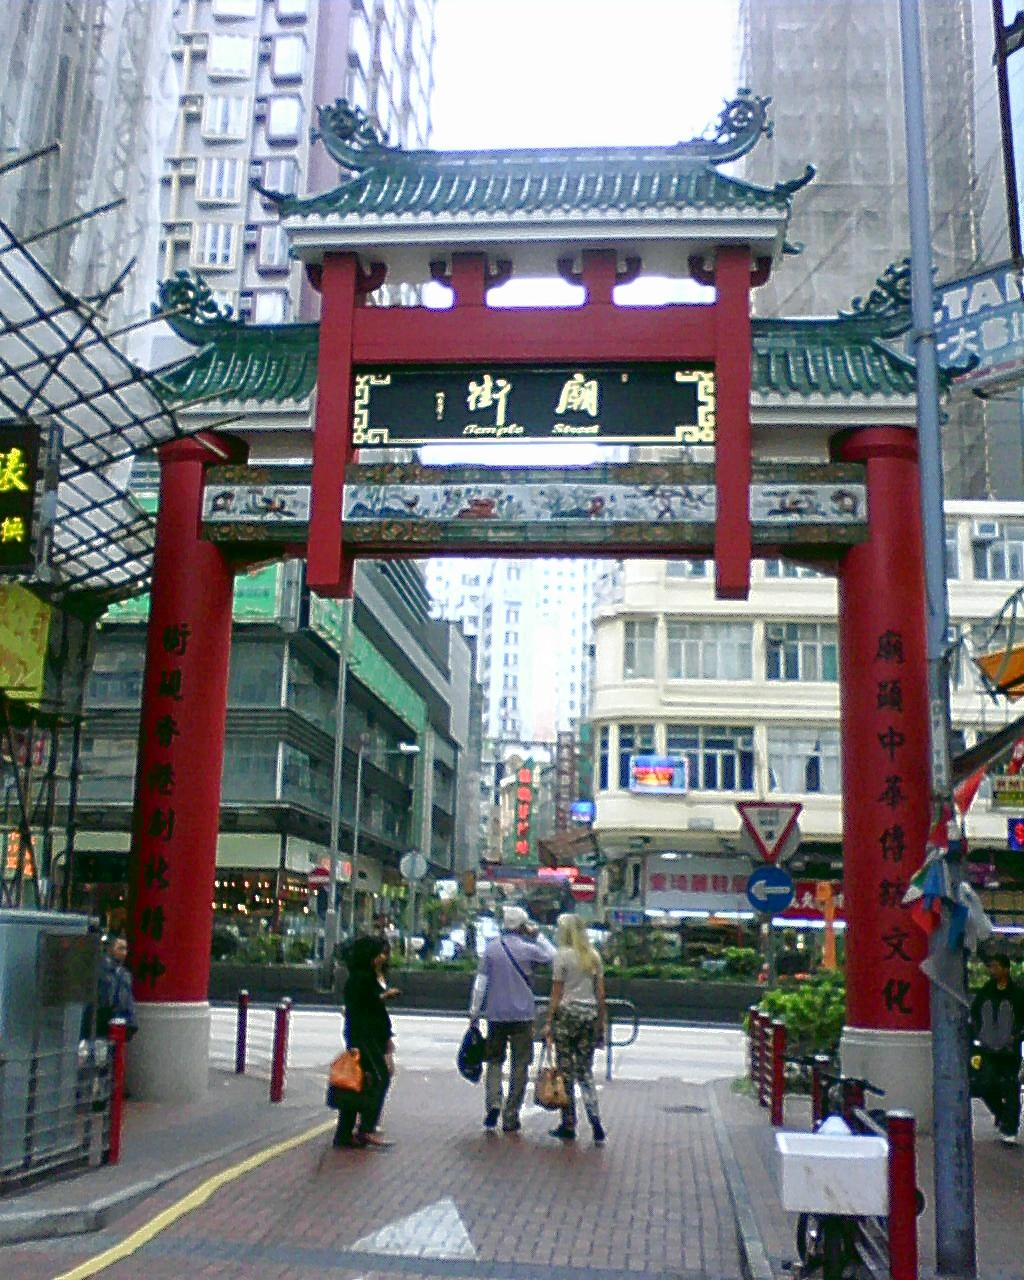 Hong Kong: Temple Street, Hong Kong